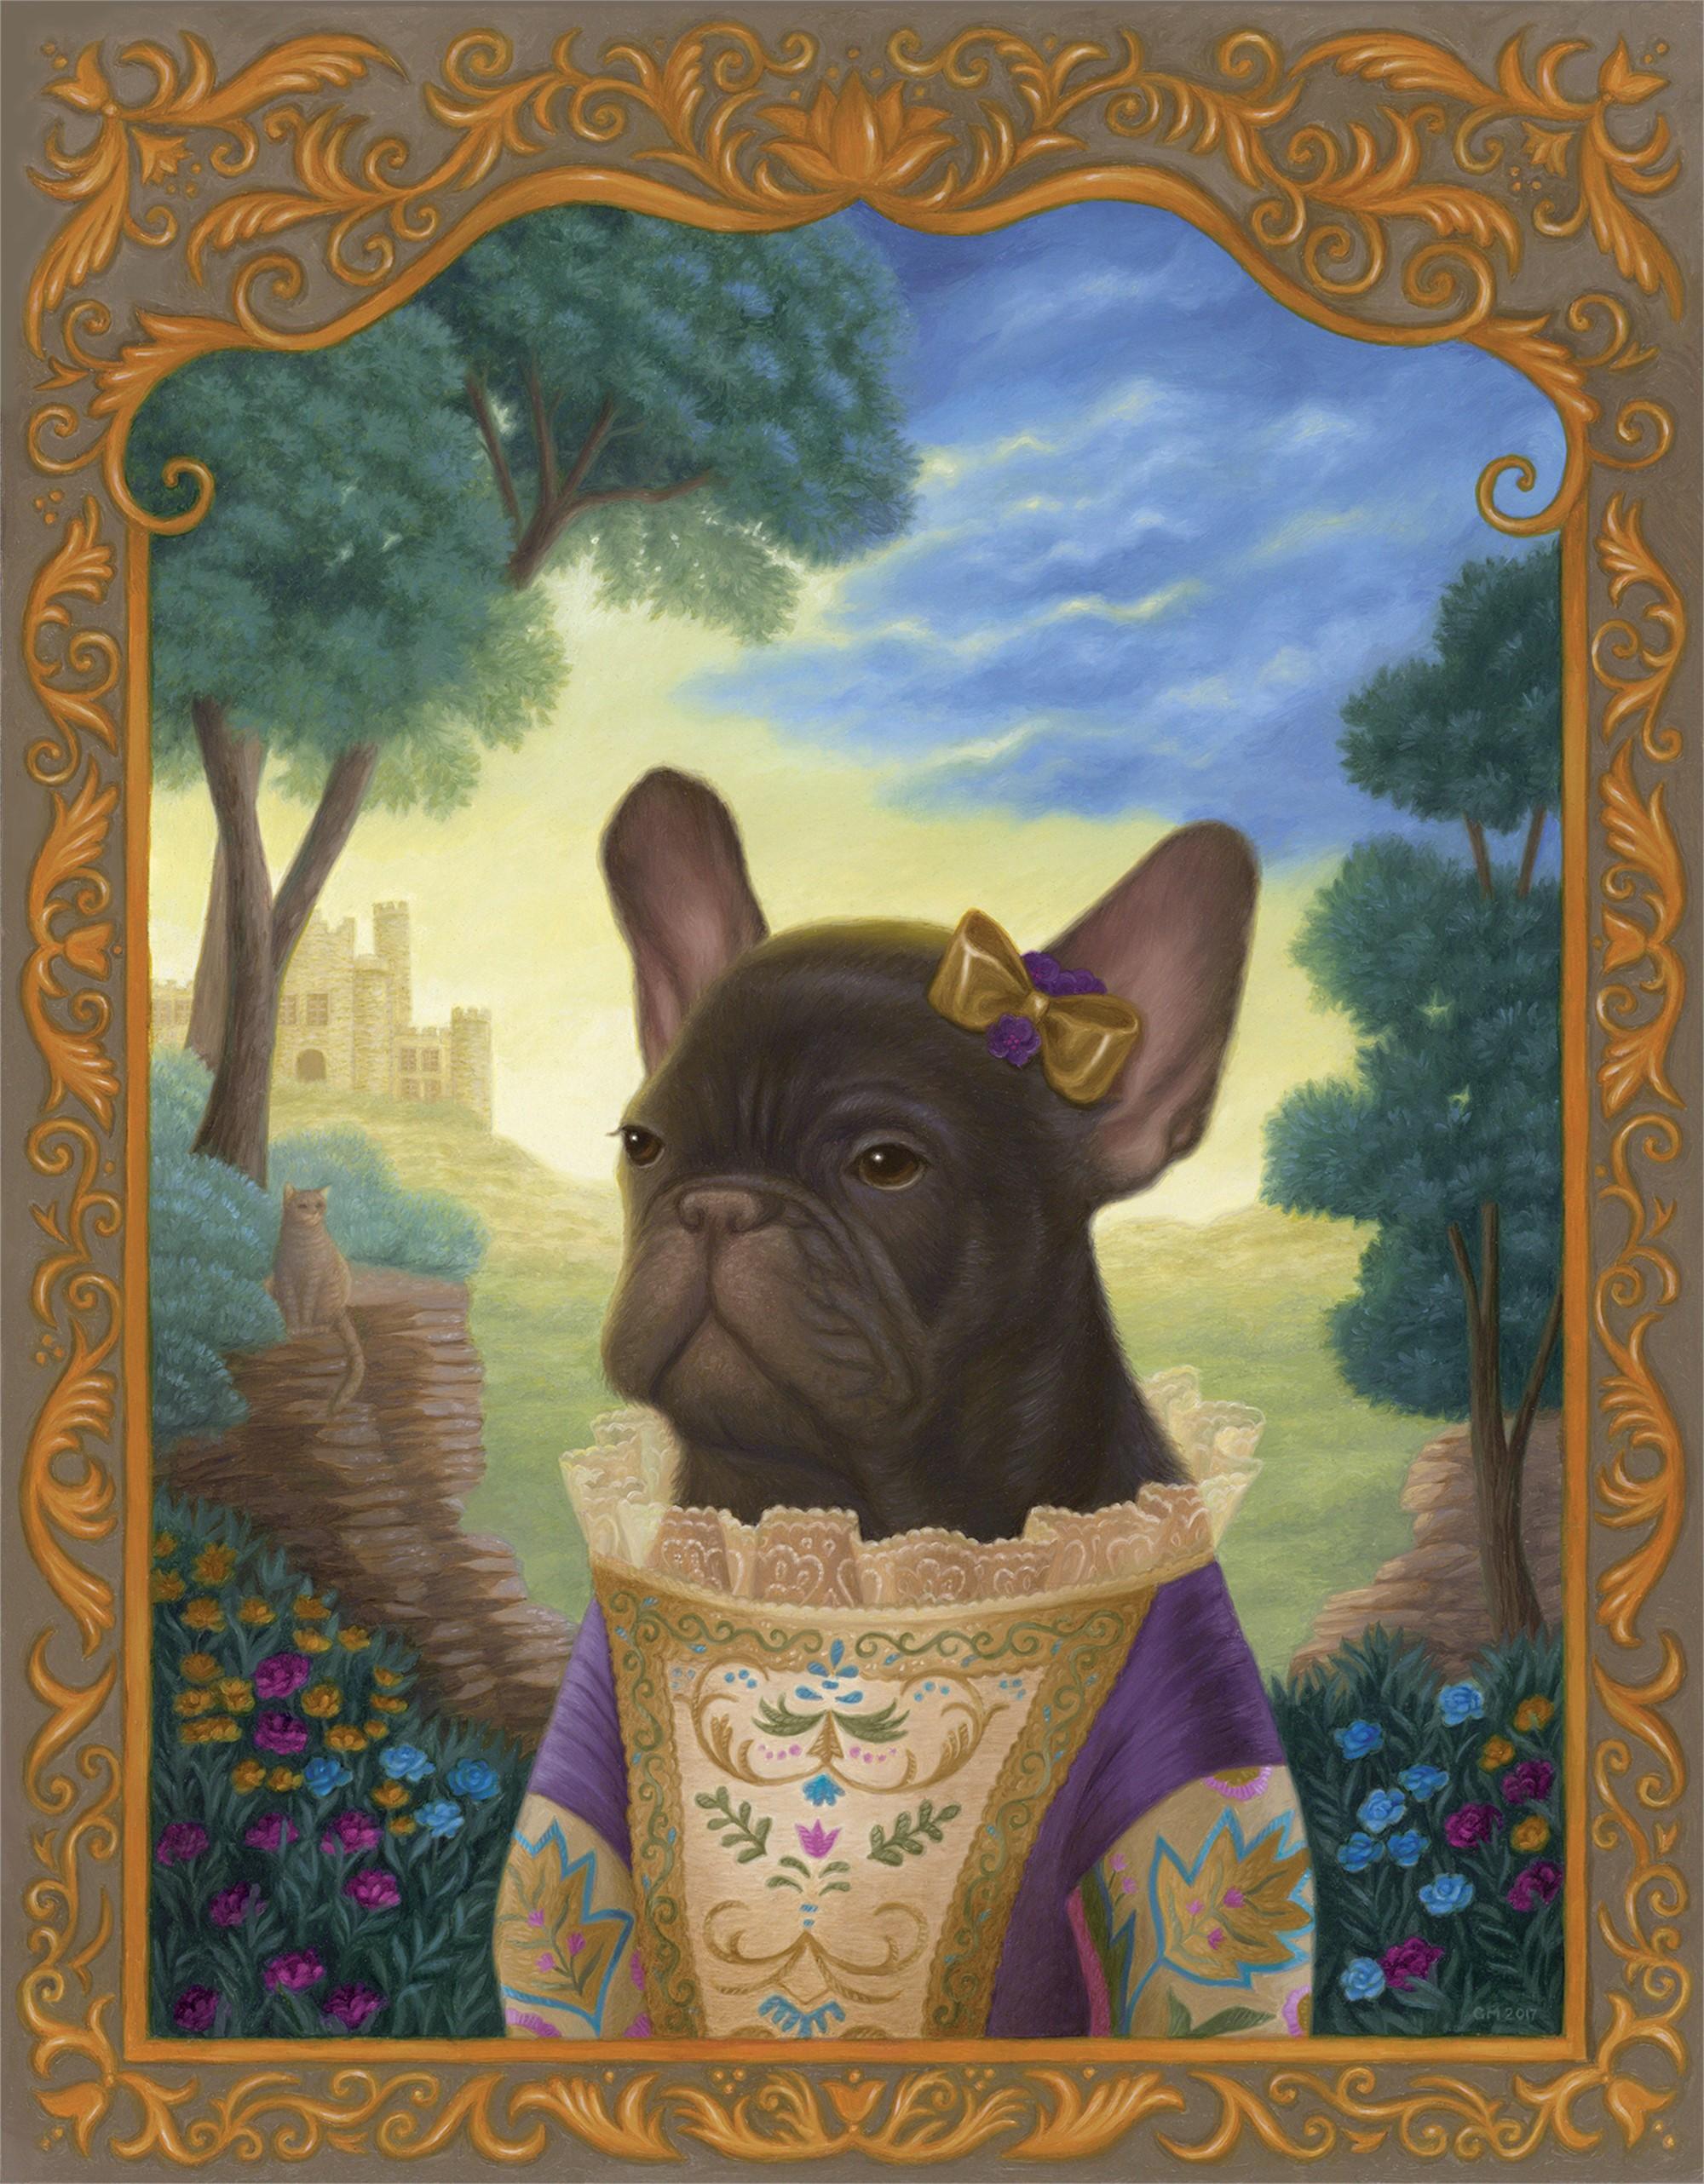 Henrietta in her Wildest Dreams by Gina Matarazzo